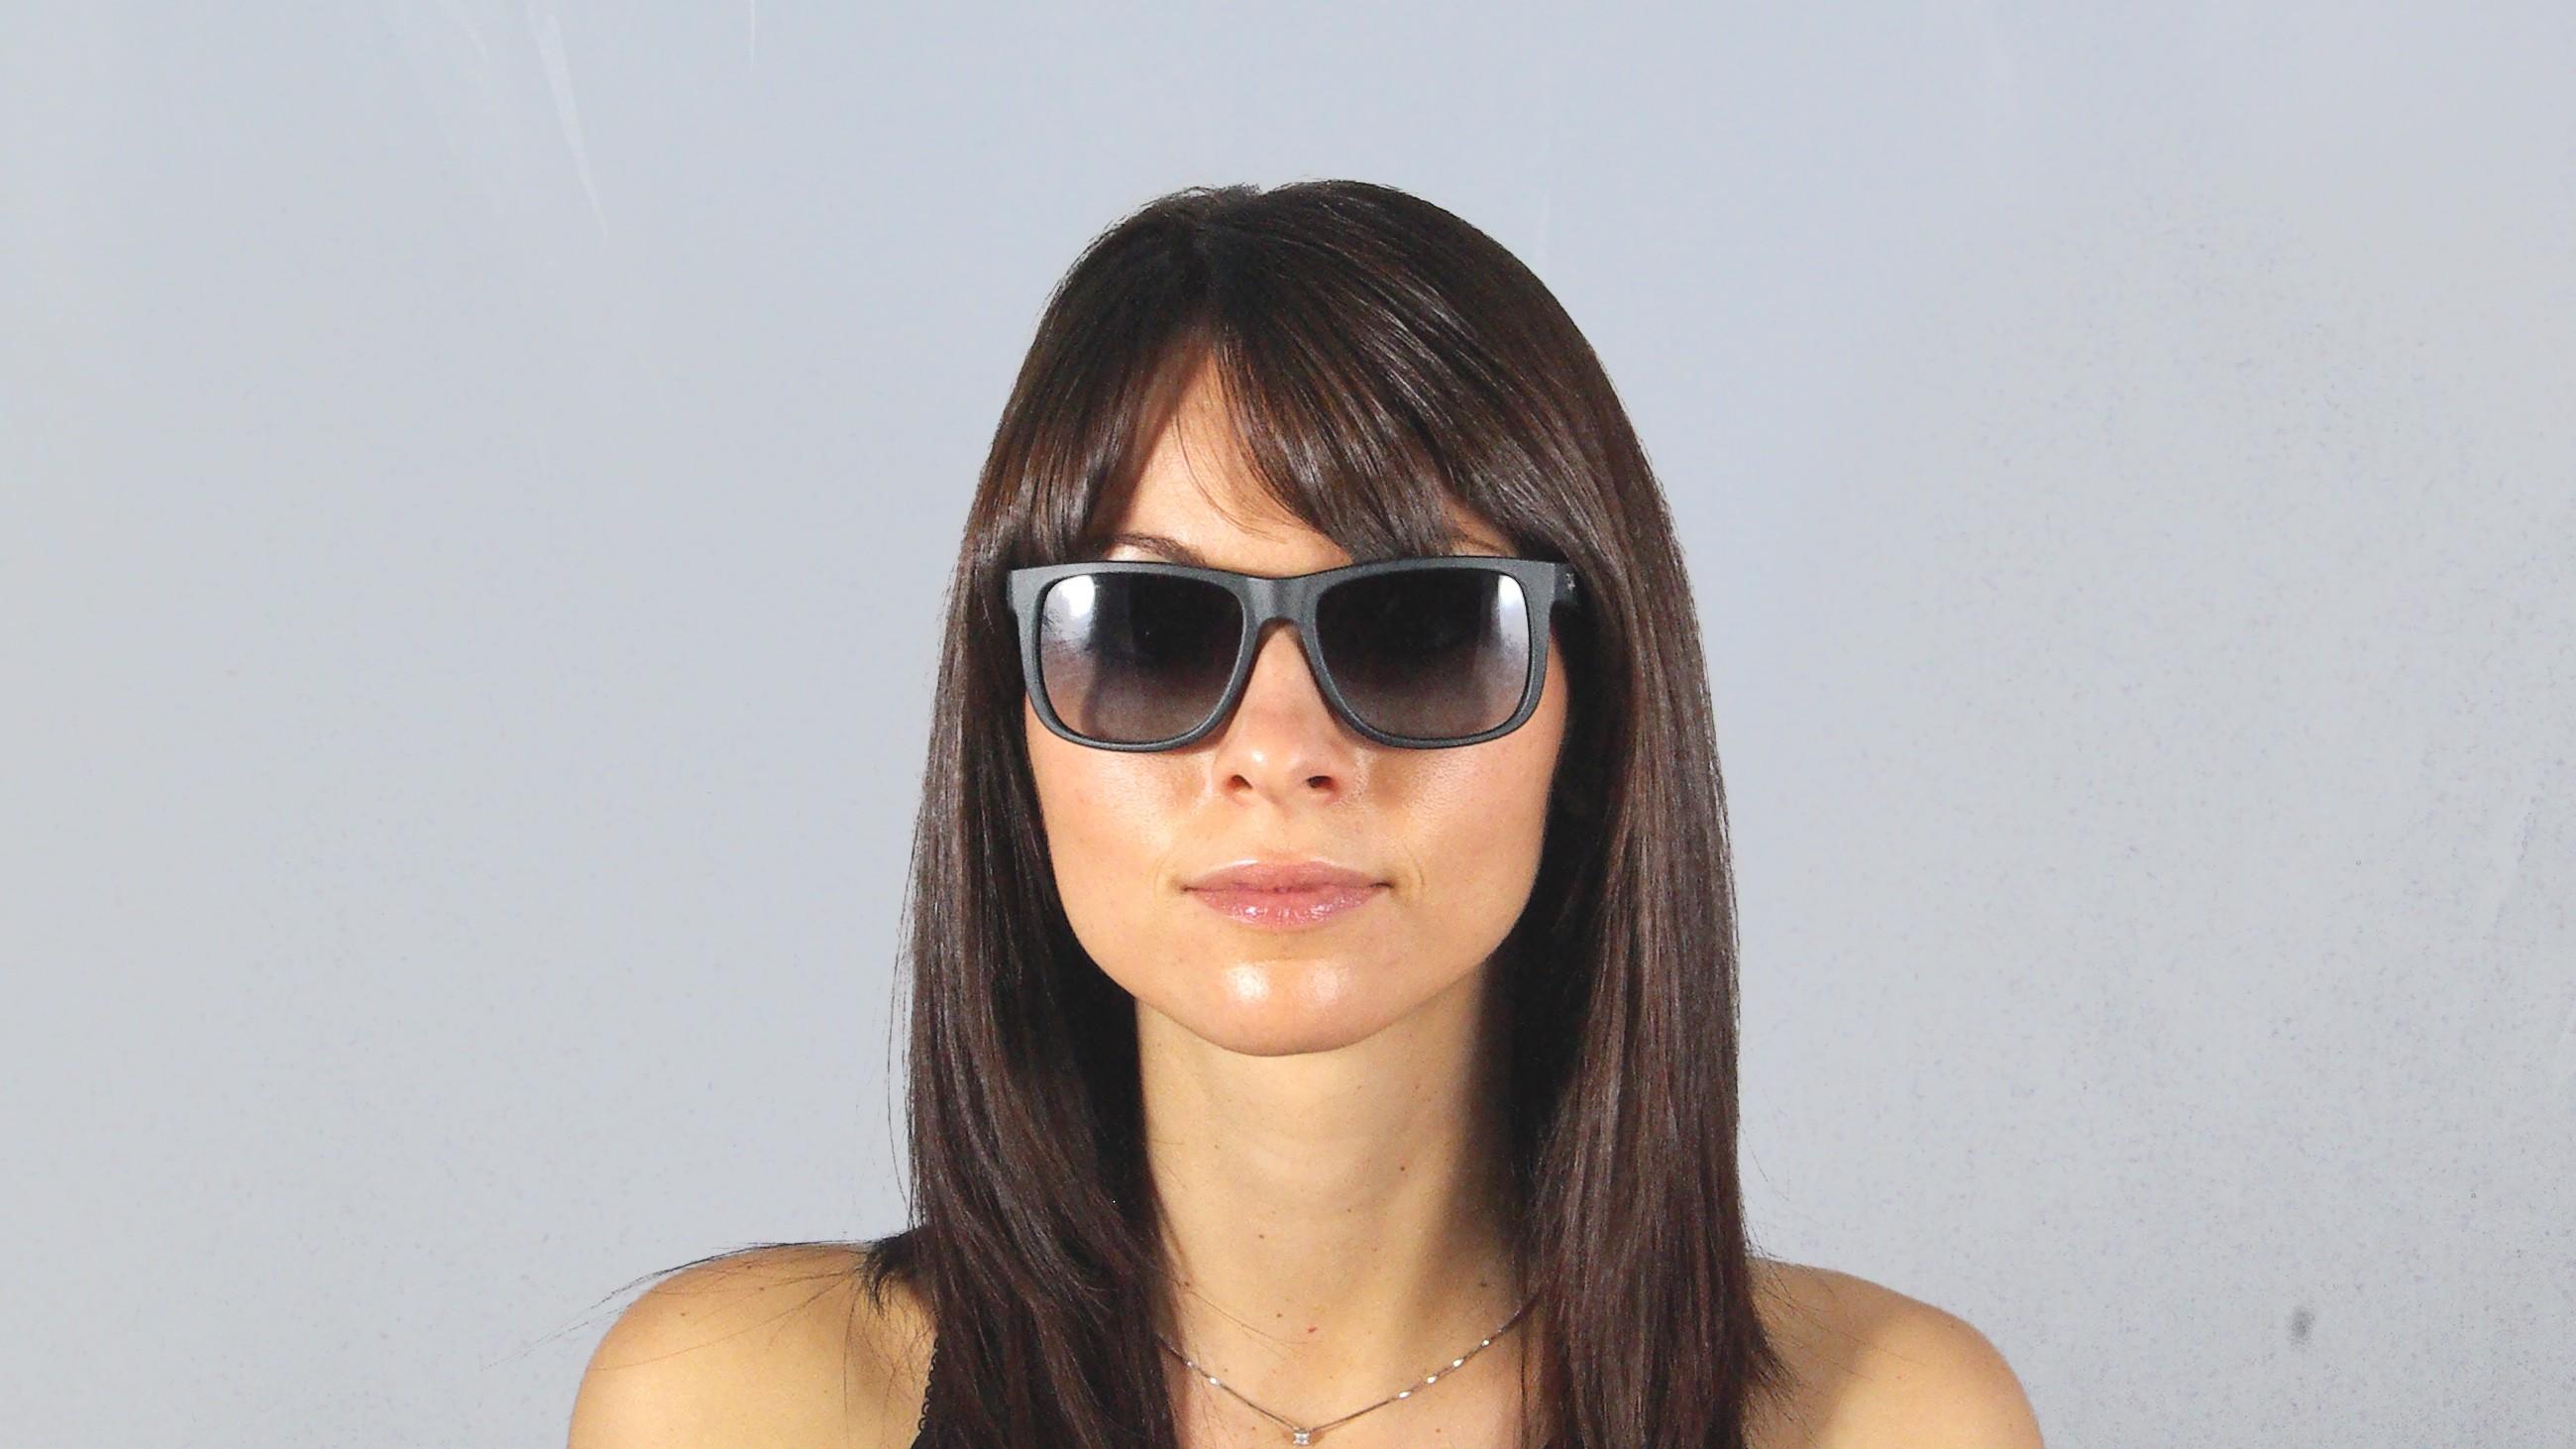 a9a874e0cab01 ... amazon sunglasses ray ban justin black rb4165 601 8g 51 16 medium  gradient 865c9 adc45